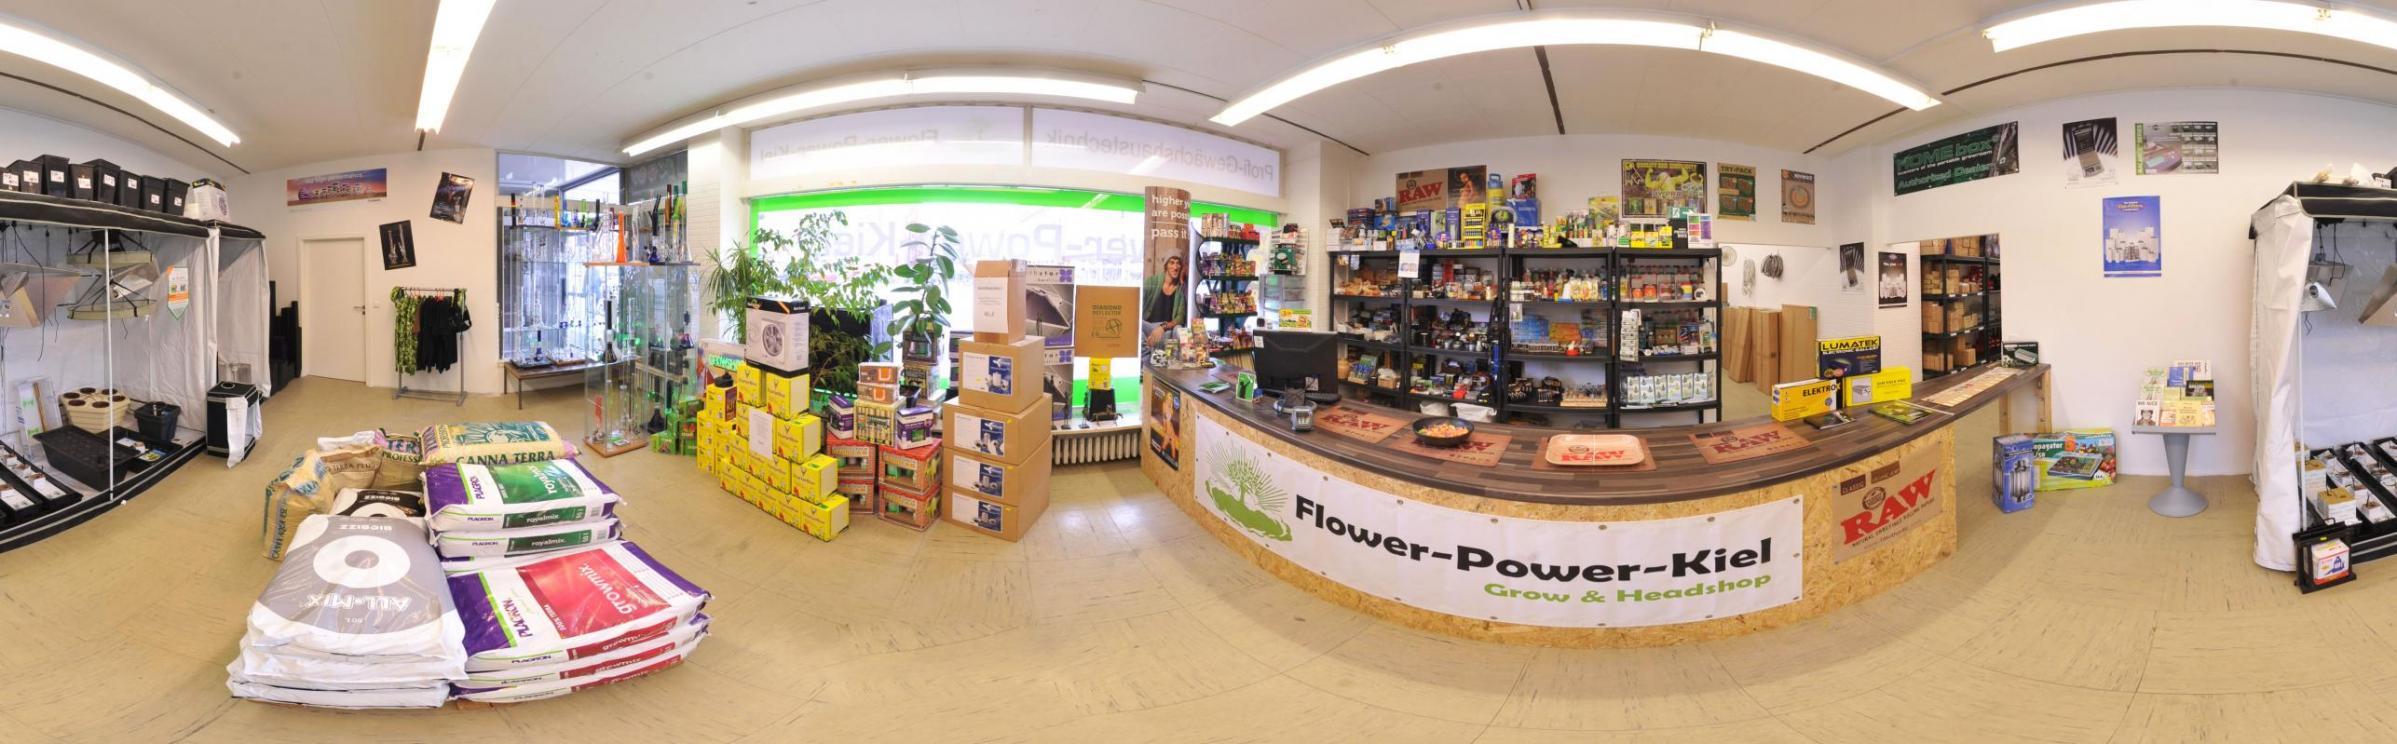 Growshop und Headshop in Kiel